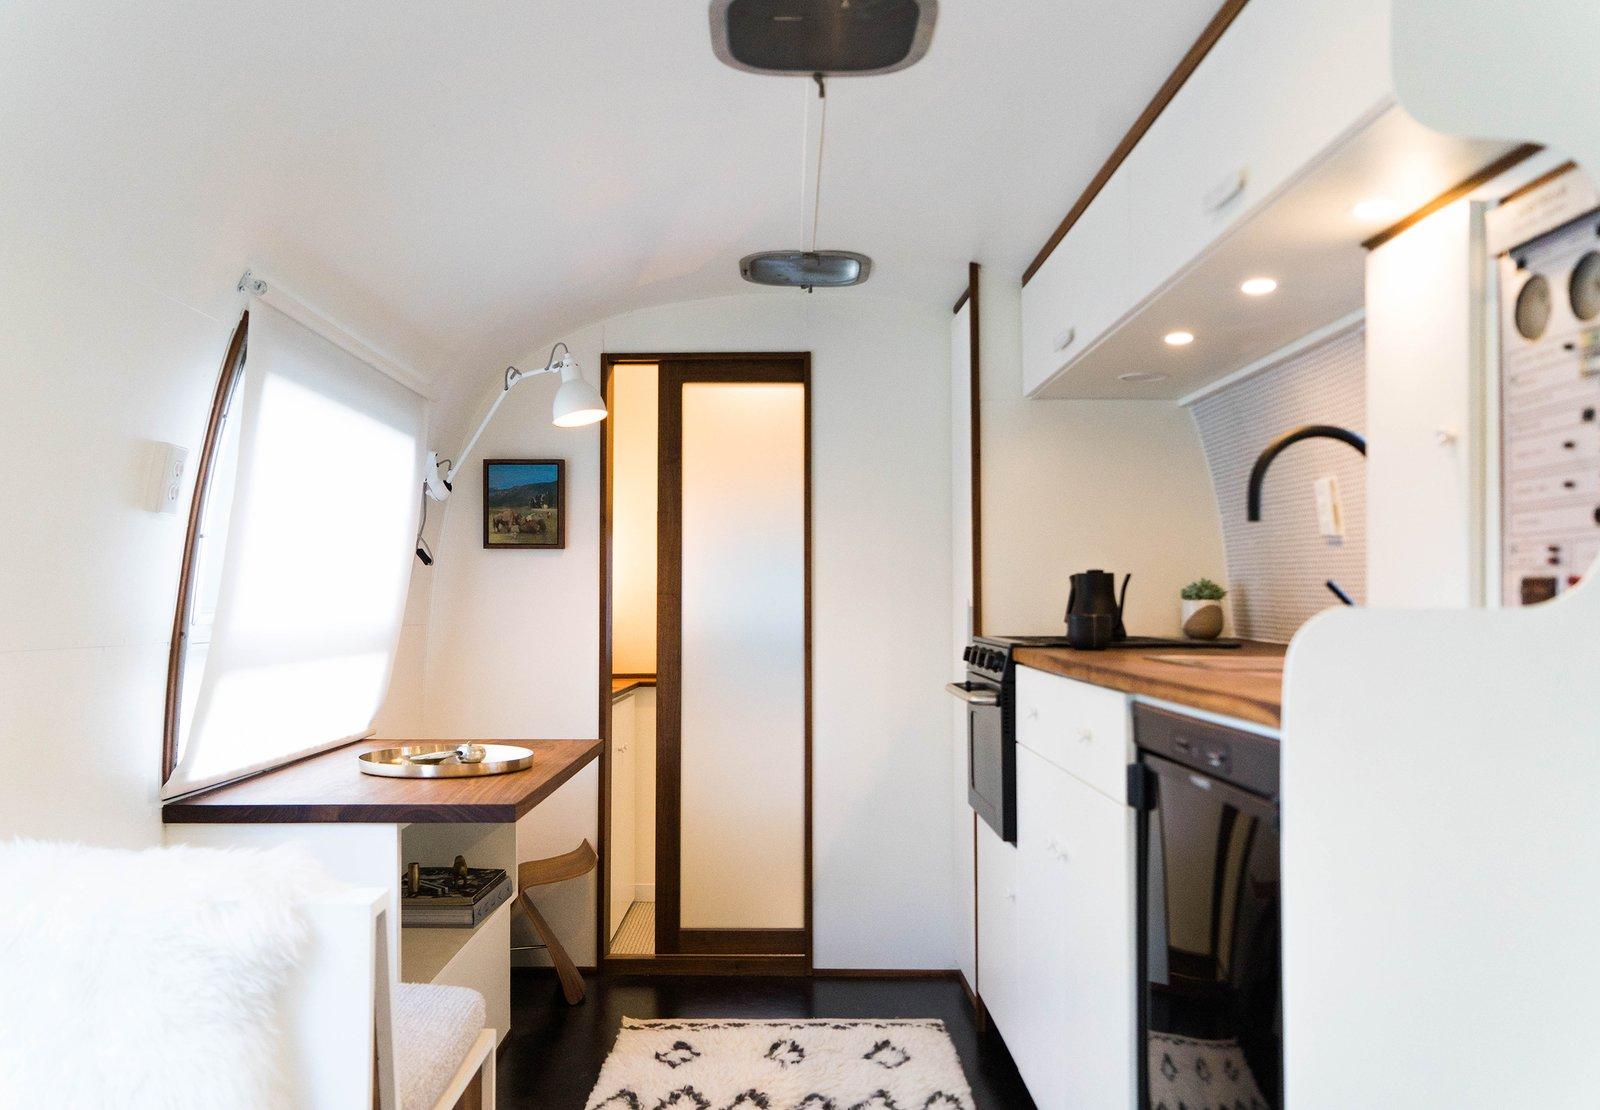 Airstream Haus kitchen